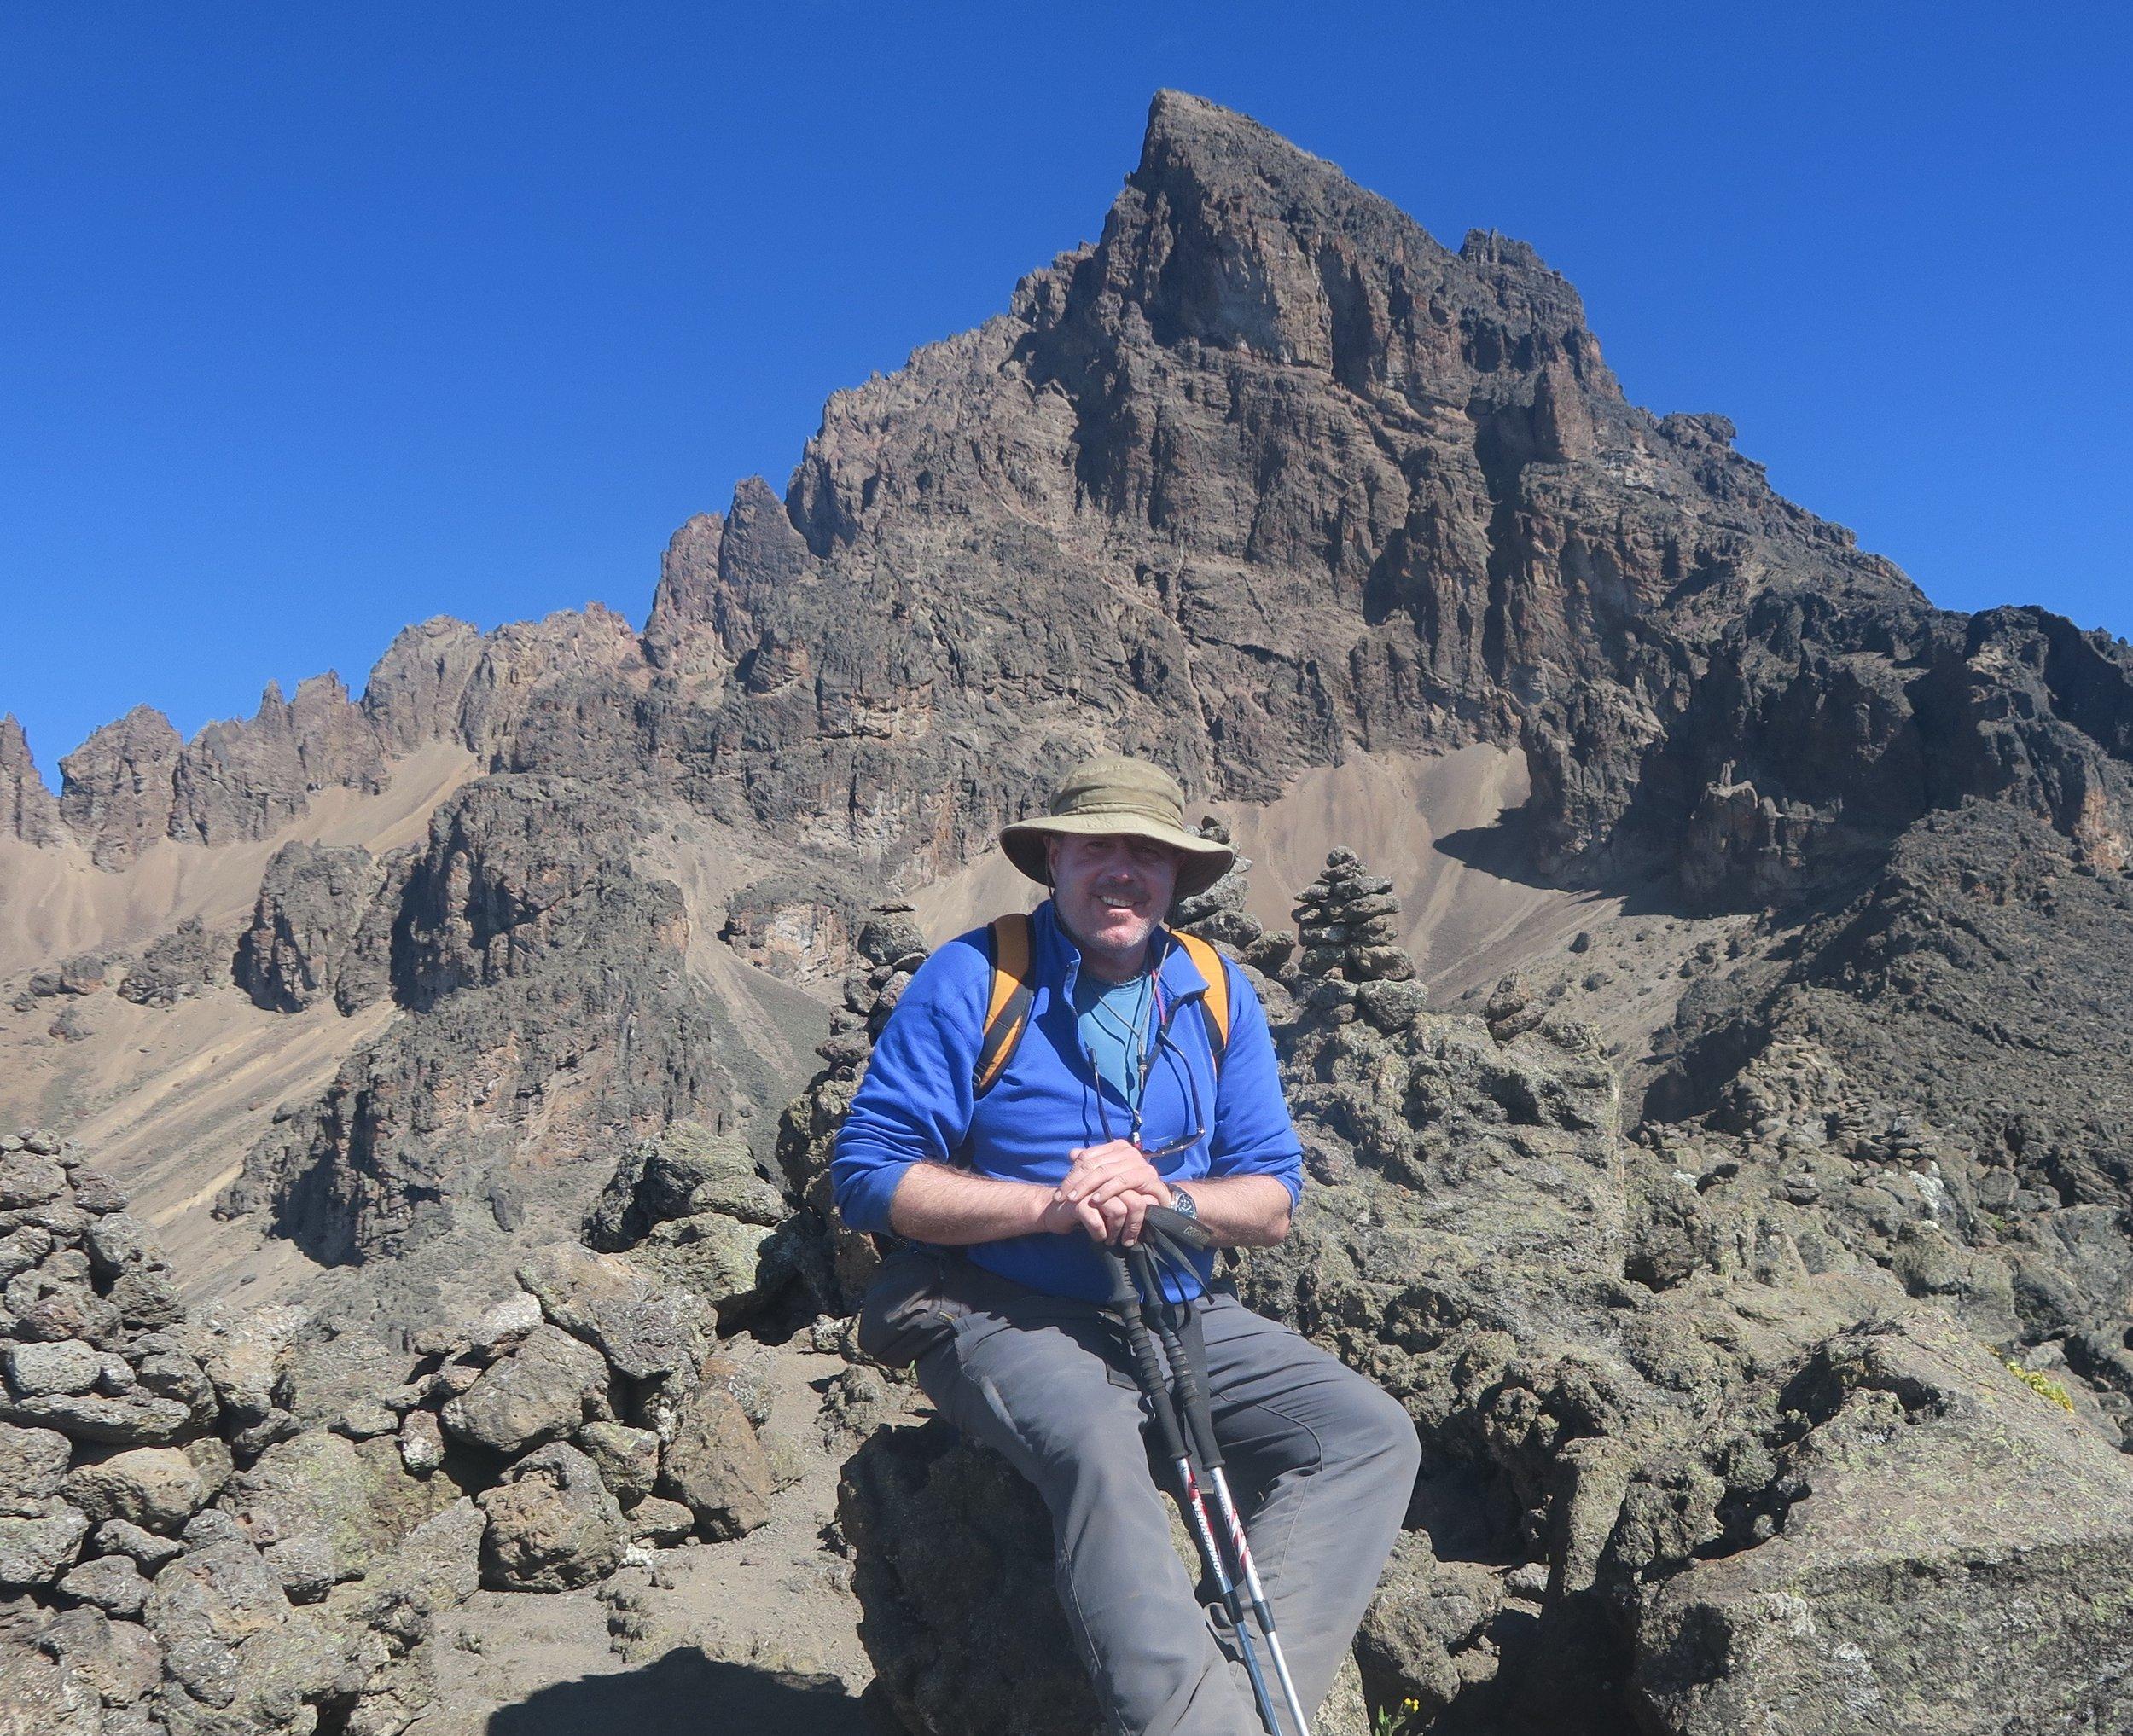 Fr. Mullen on an acclimatization hike on the slopes of Kilimanjaro, July 2016